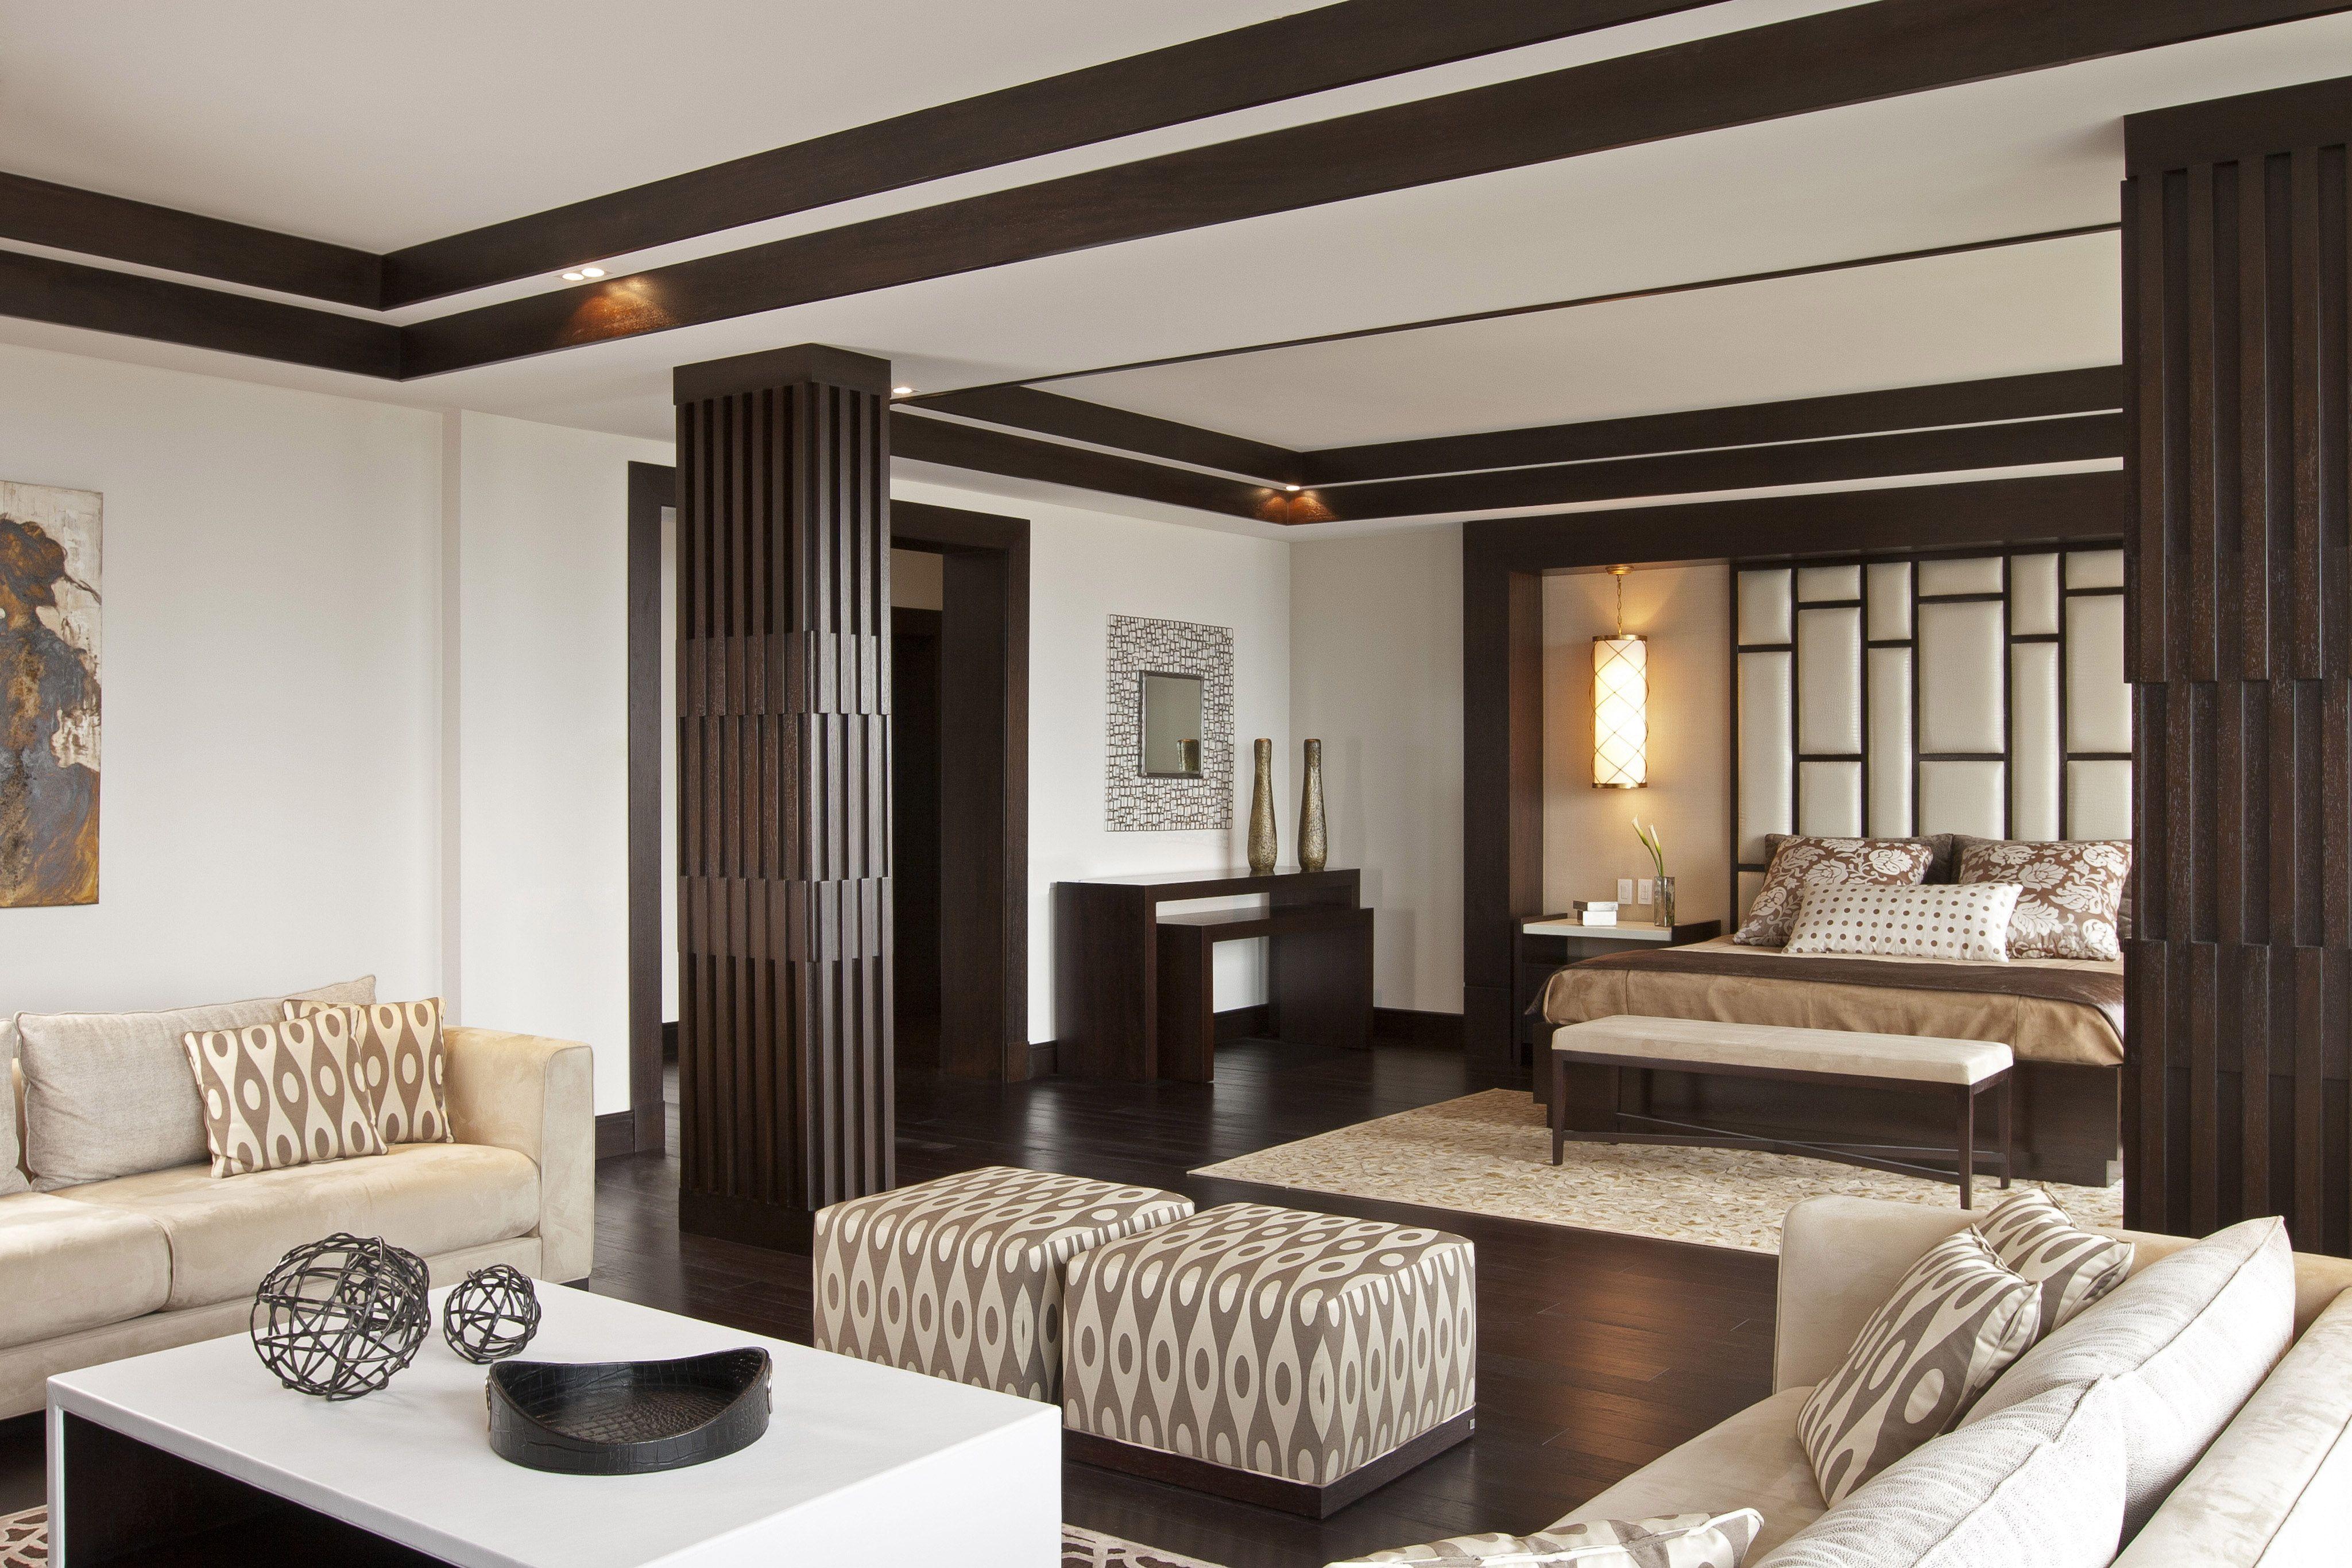 Residential project by adriana hoyos perezalaya interiordesign bedroom hoyos deco - Decoracion barata hogar ...